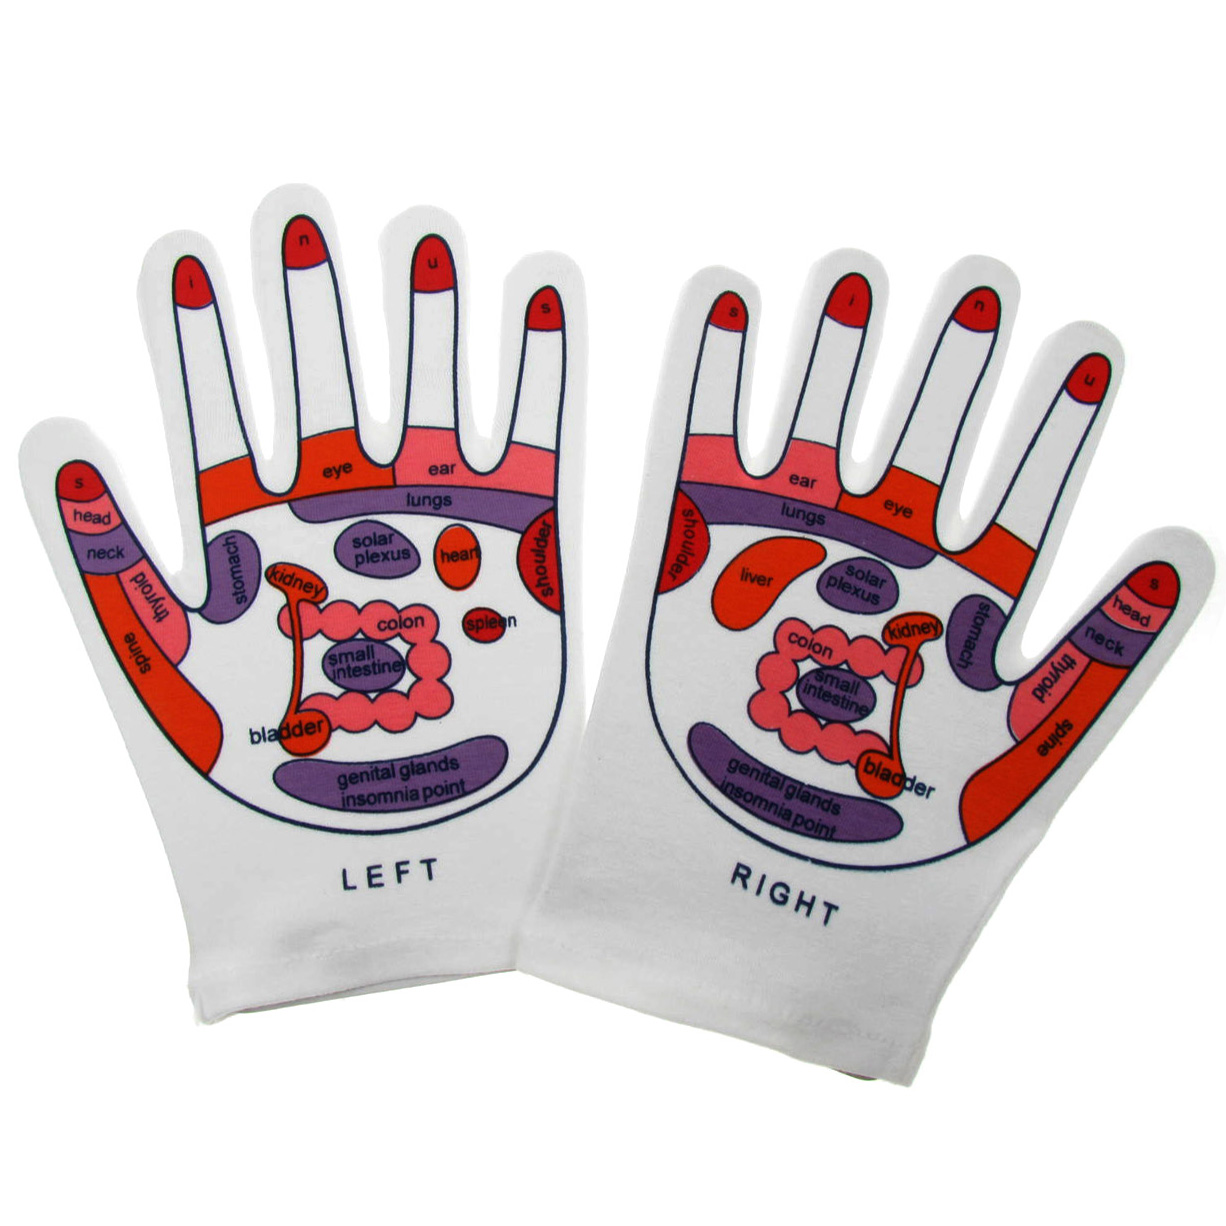 Strange patent... for a 'hand reflexology glove'!??? Natural%20Products%20Pink%20Cotton%20Reflexology%20Massage%20Glove%20-%20Pair